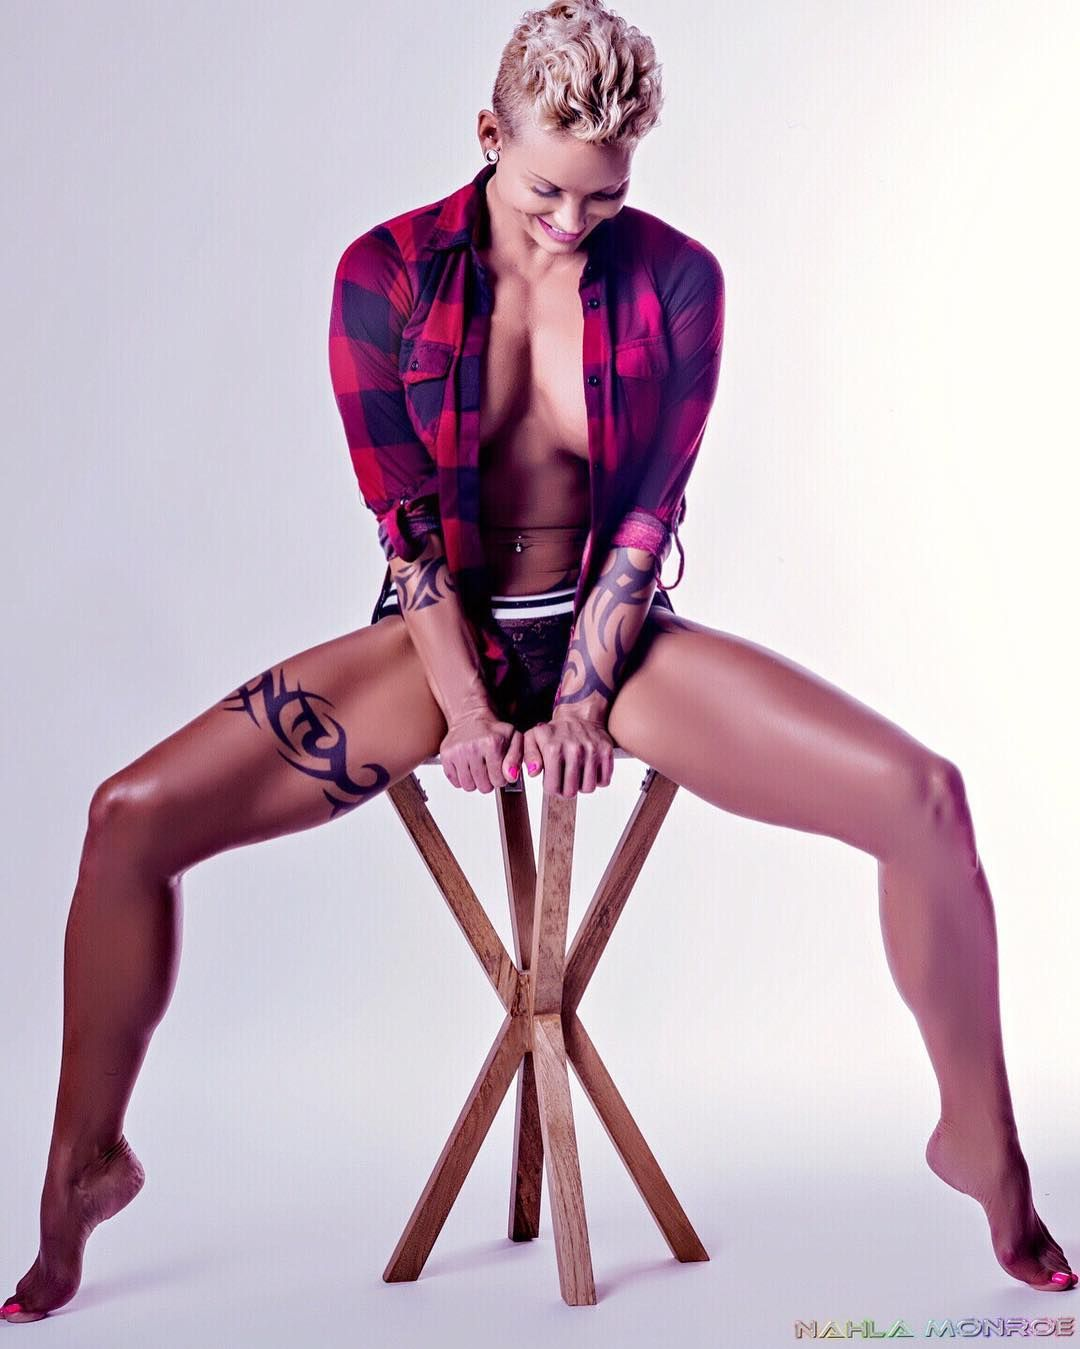 Bikini Nahla R. Monroe nude (71 photos), Pussy, Leaked, Twitter, swimsuit 2019